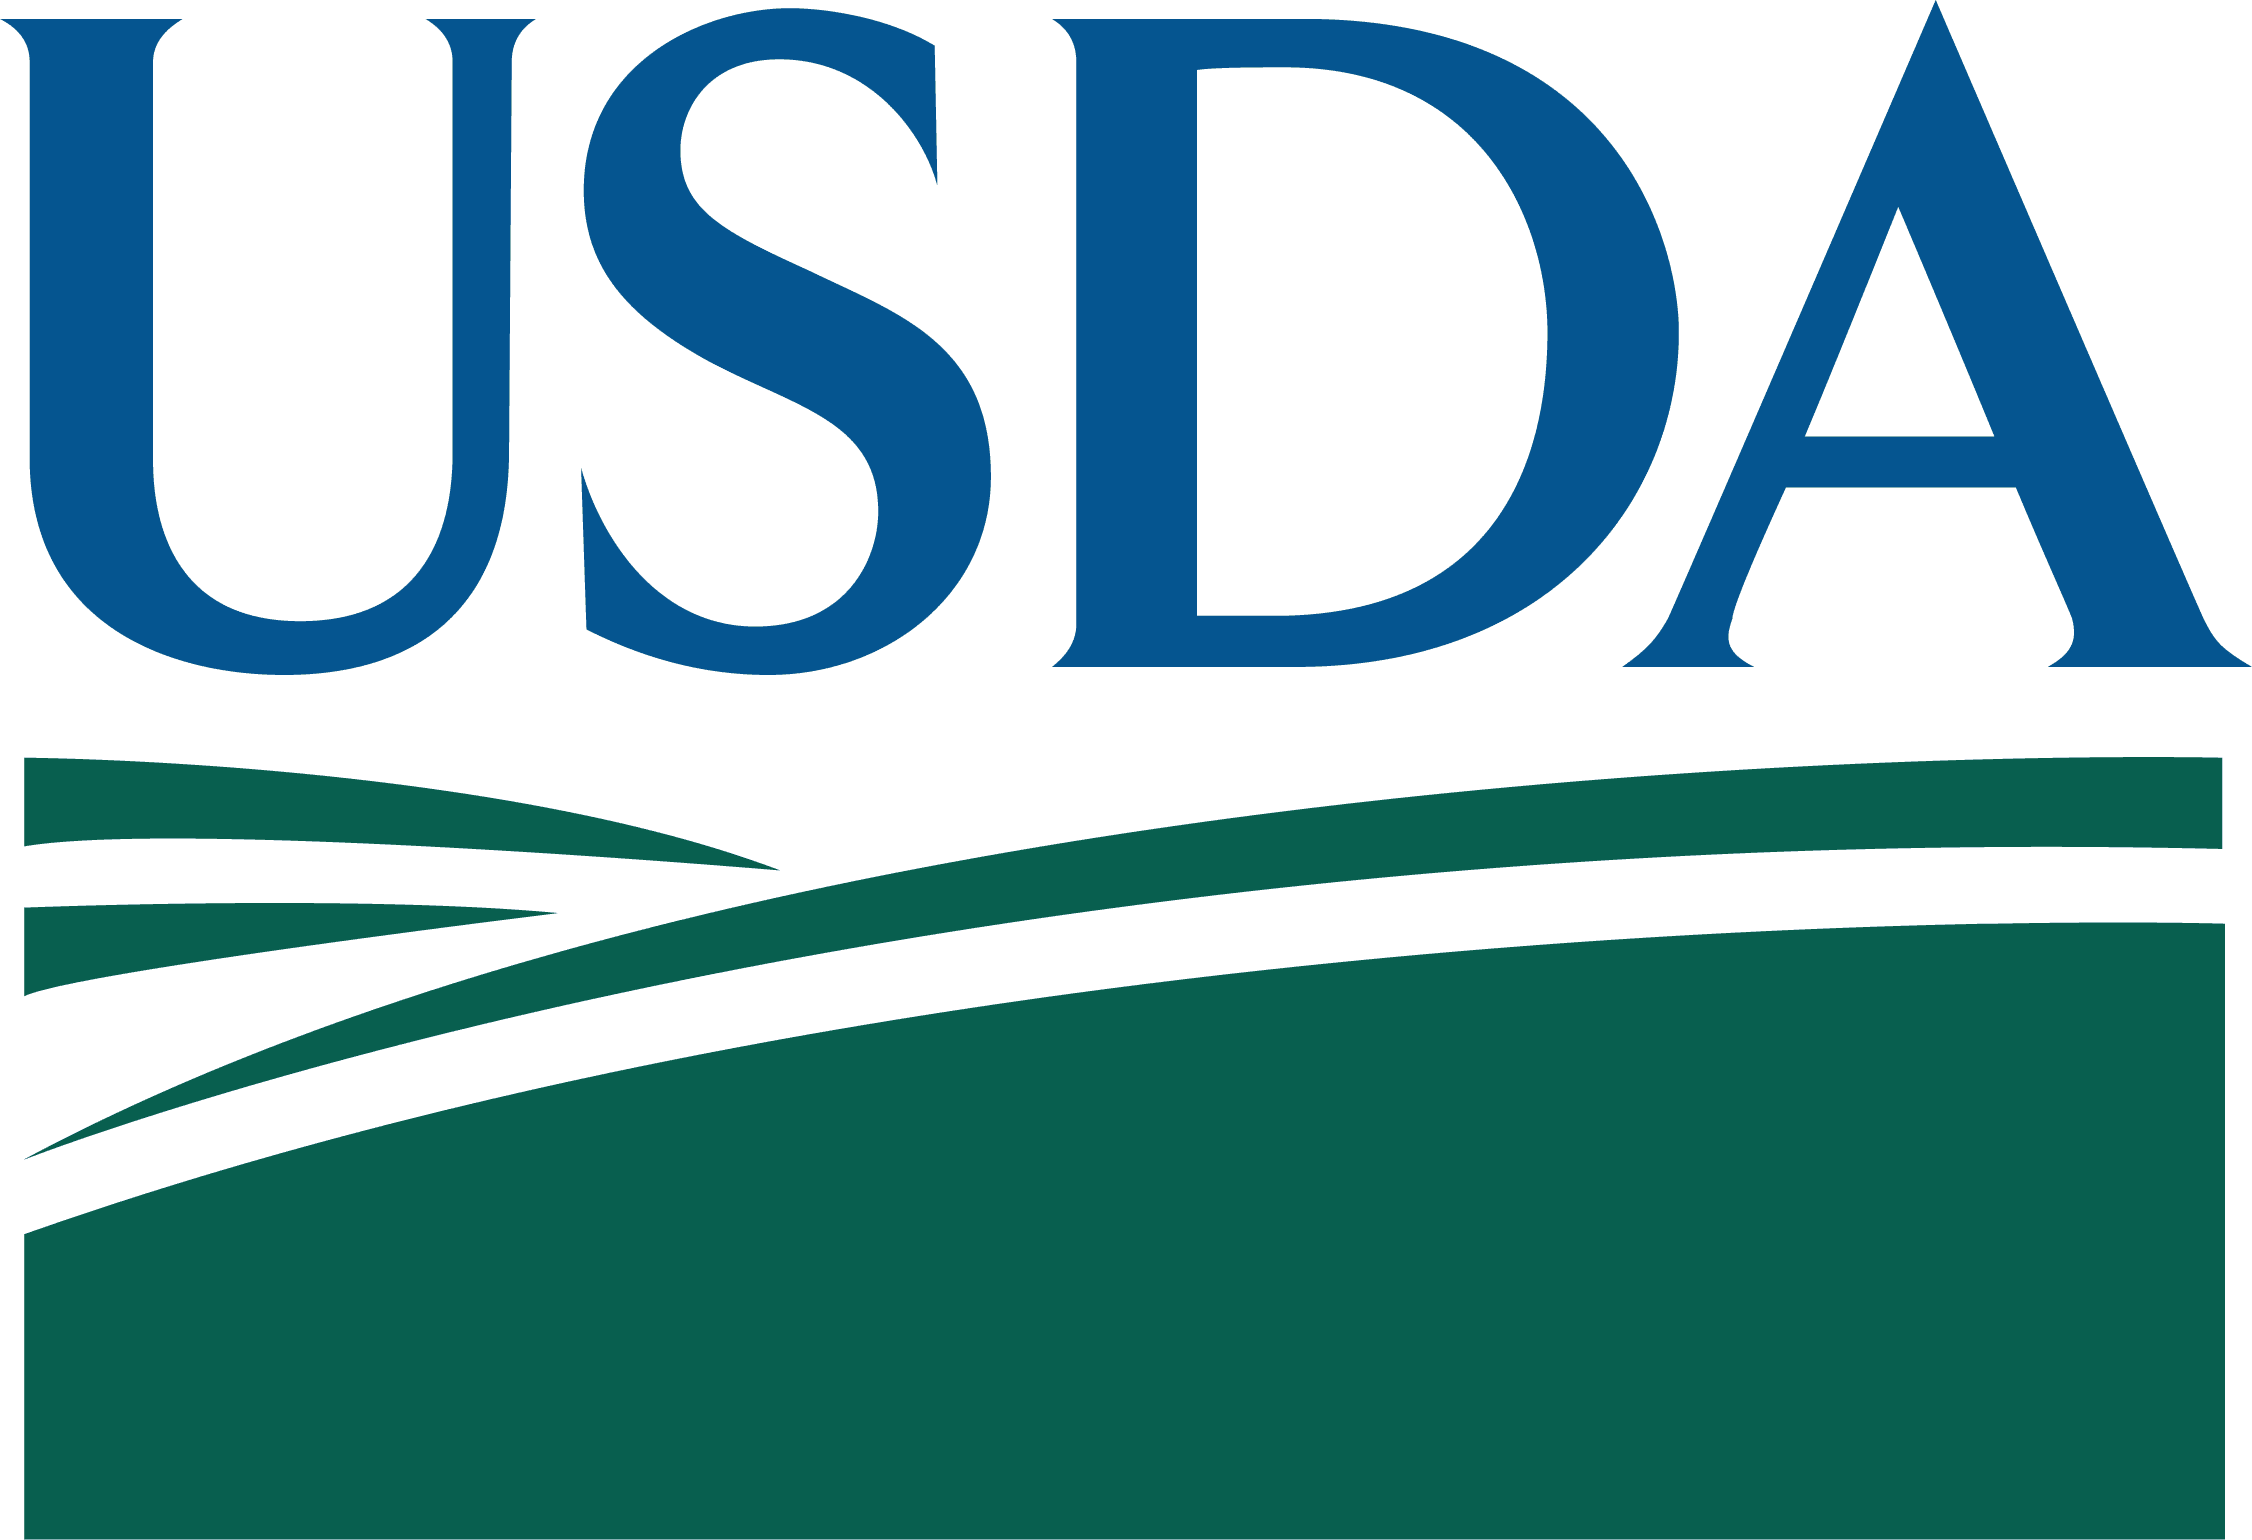 USDA Wild Florida